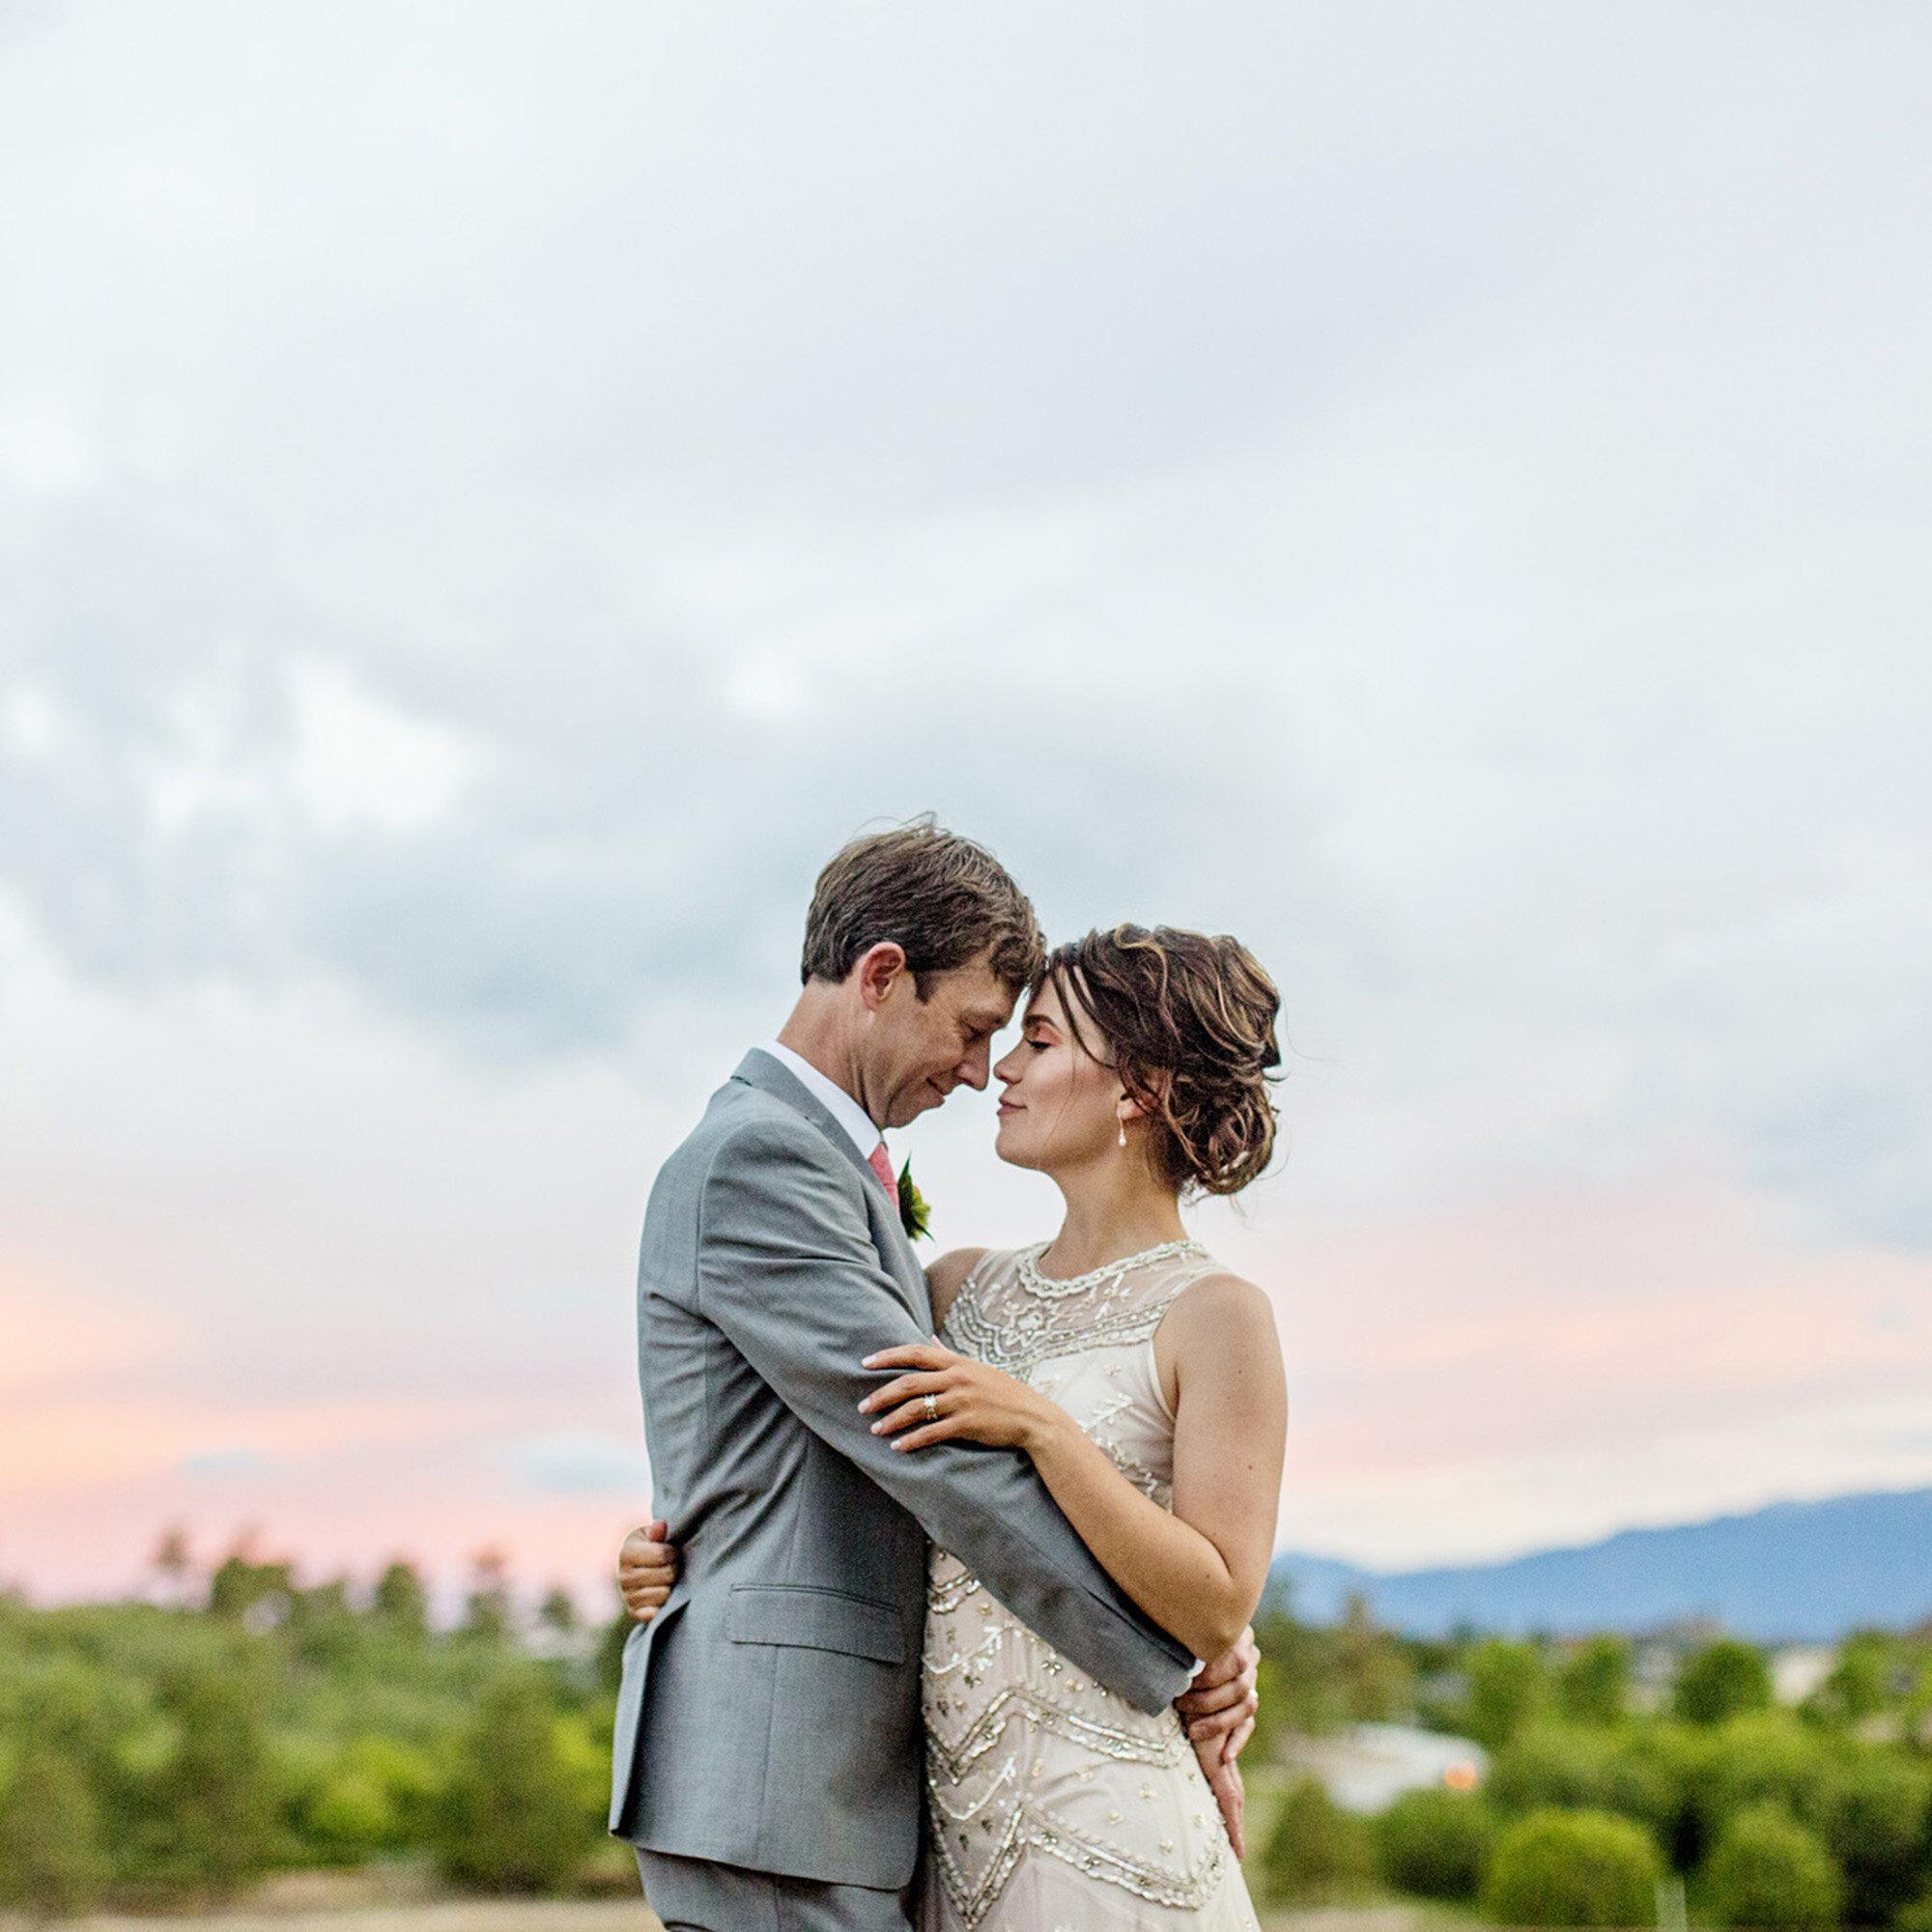 Seriously_Sabrina_Photography_Colorado_Springs_Club_at_Flying_Horse_Destination_Wedding_ODwyer88.jpg